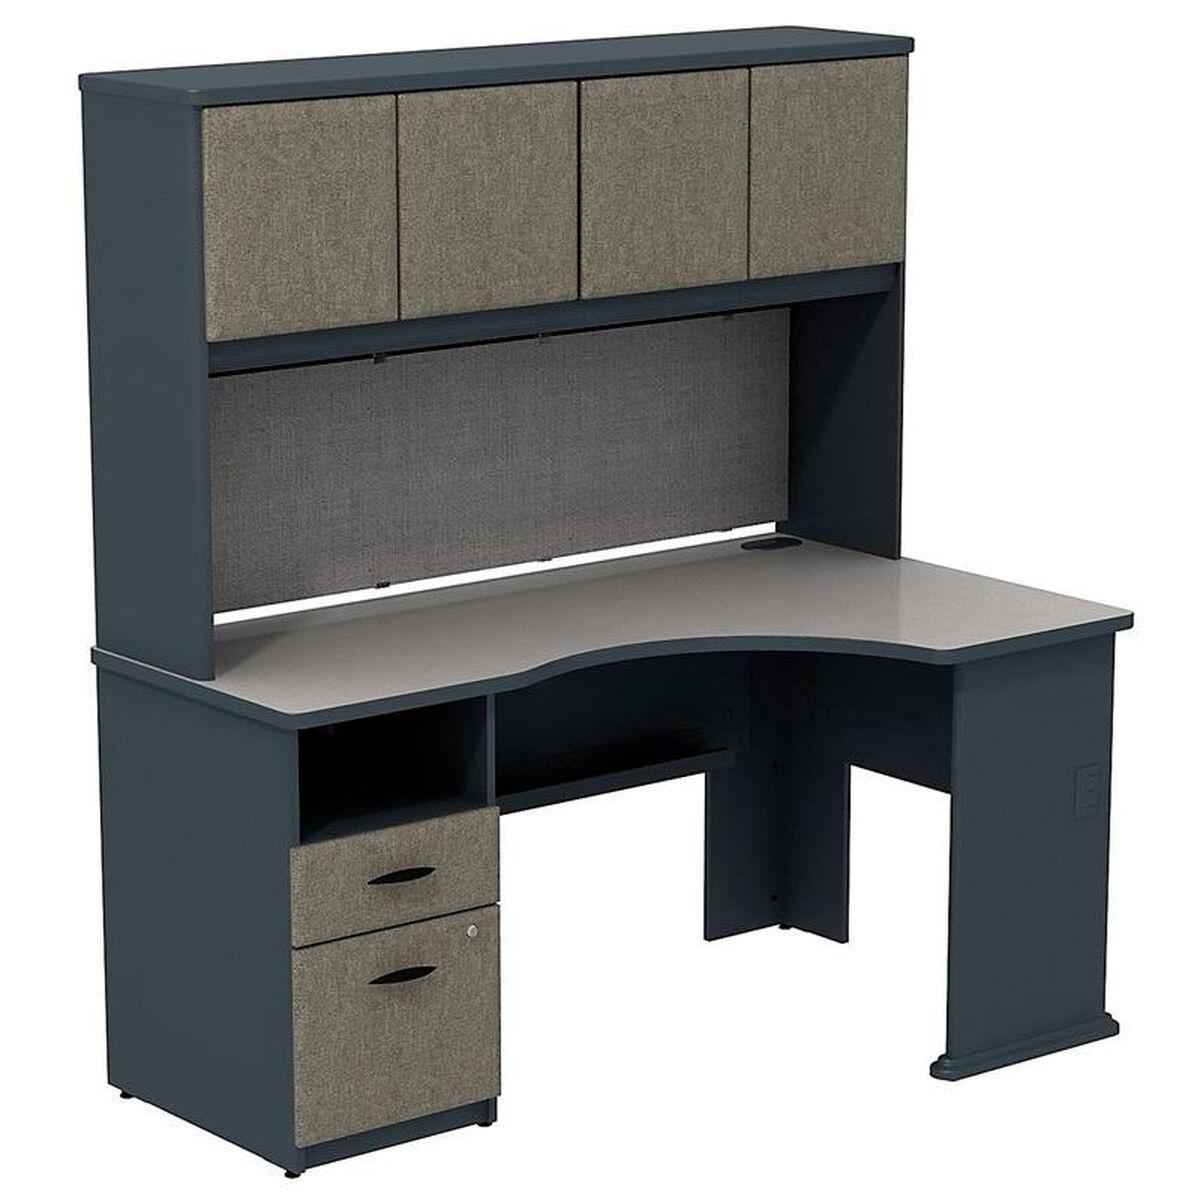 Our Series A 60 W X 36 D Single Pedestal Corner Desk